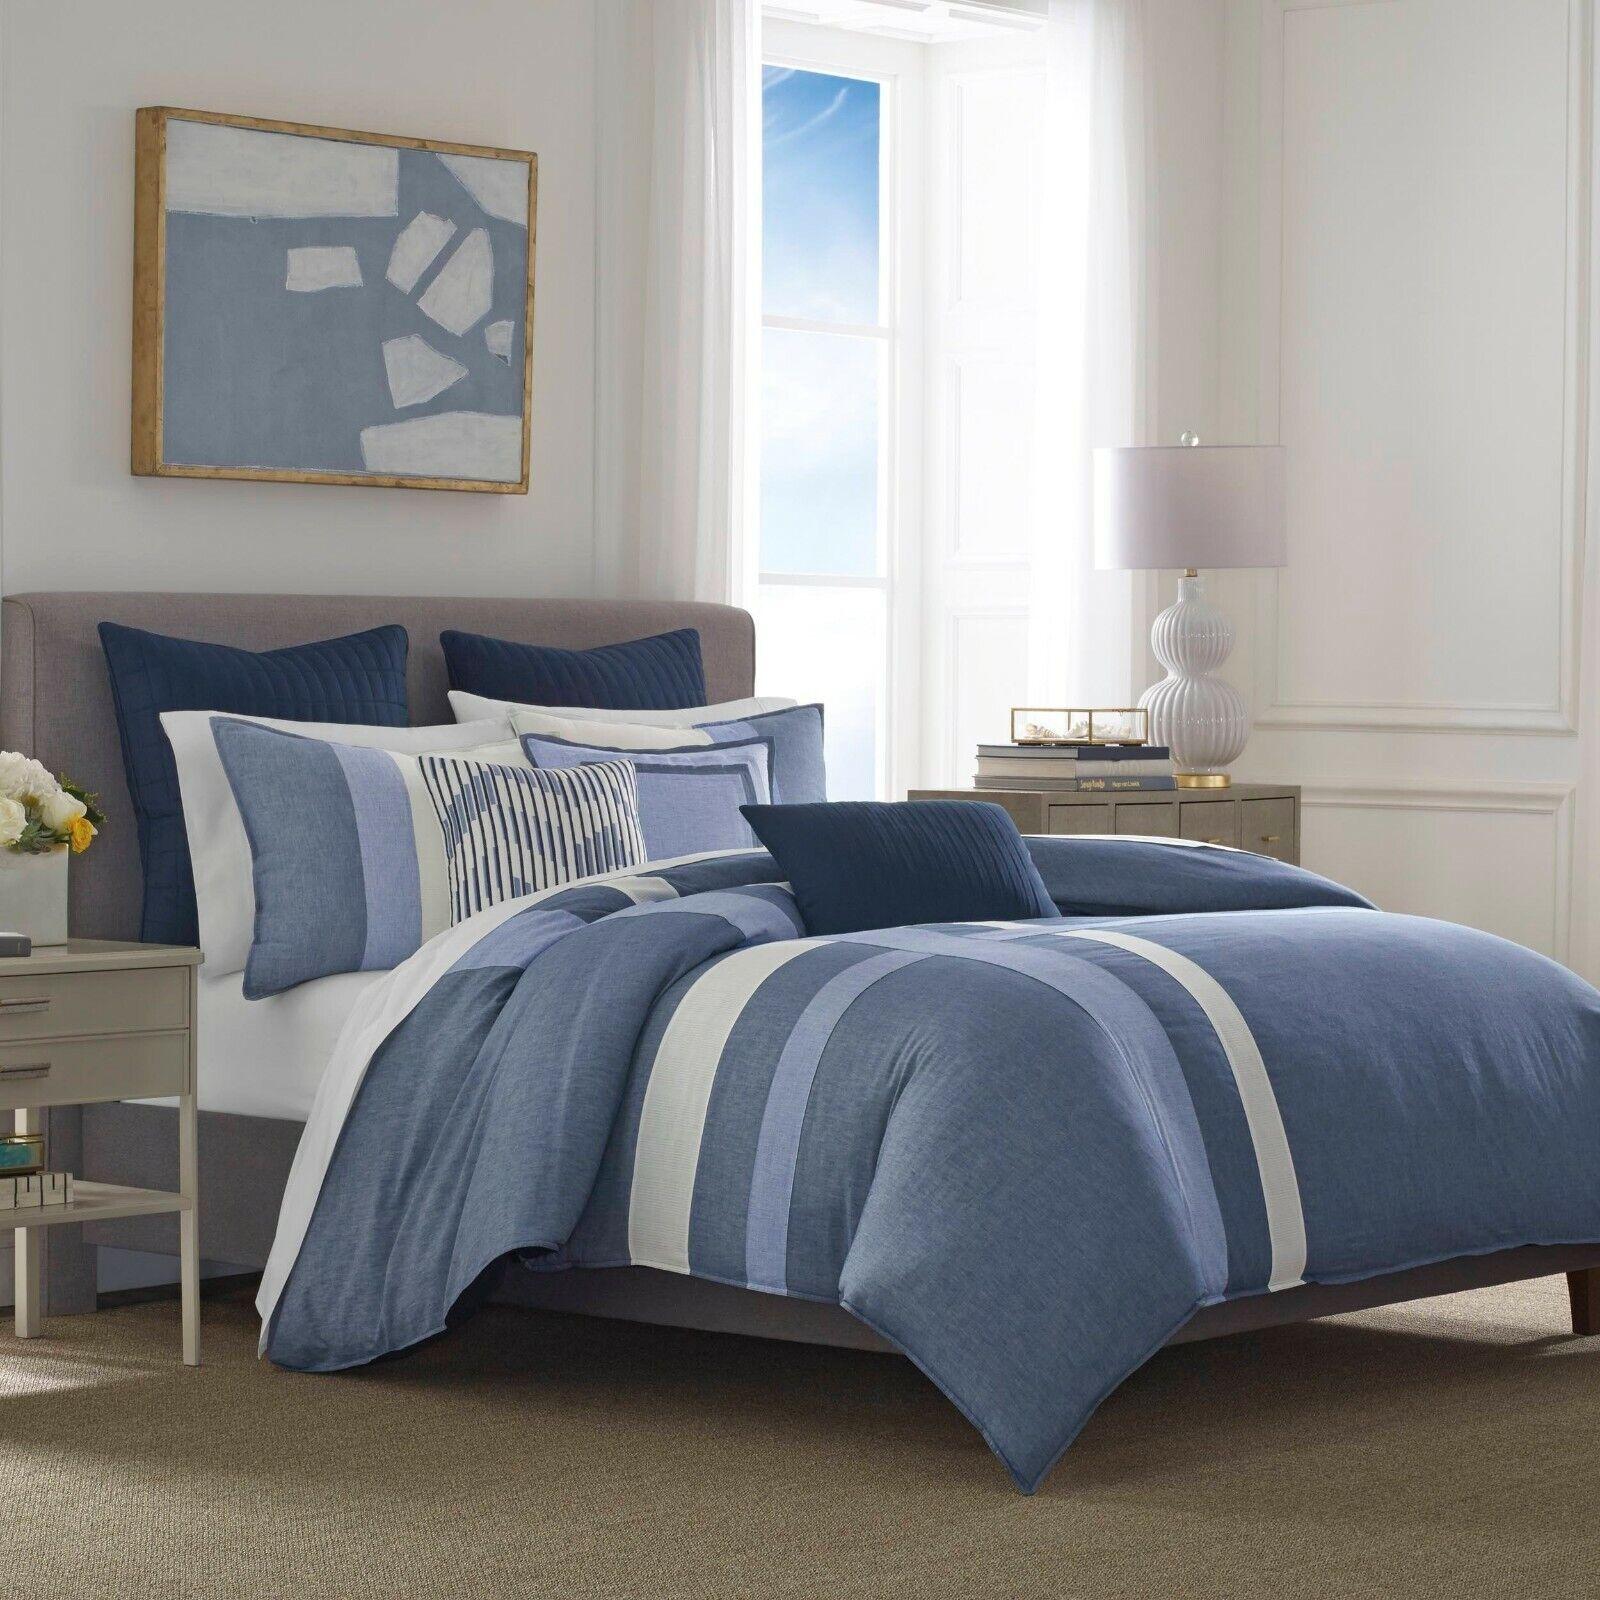 Nautica Waterbury 3 Piece king Comforter Set